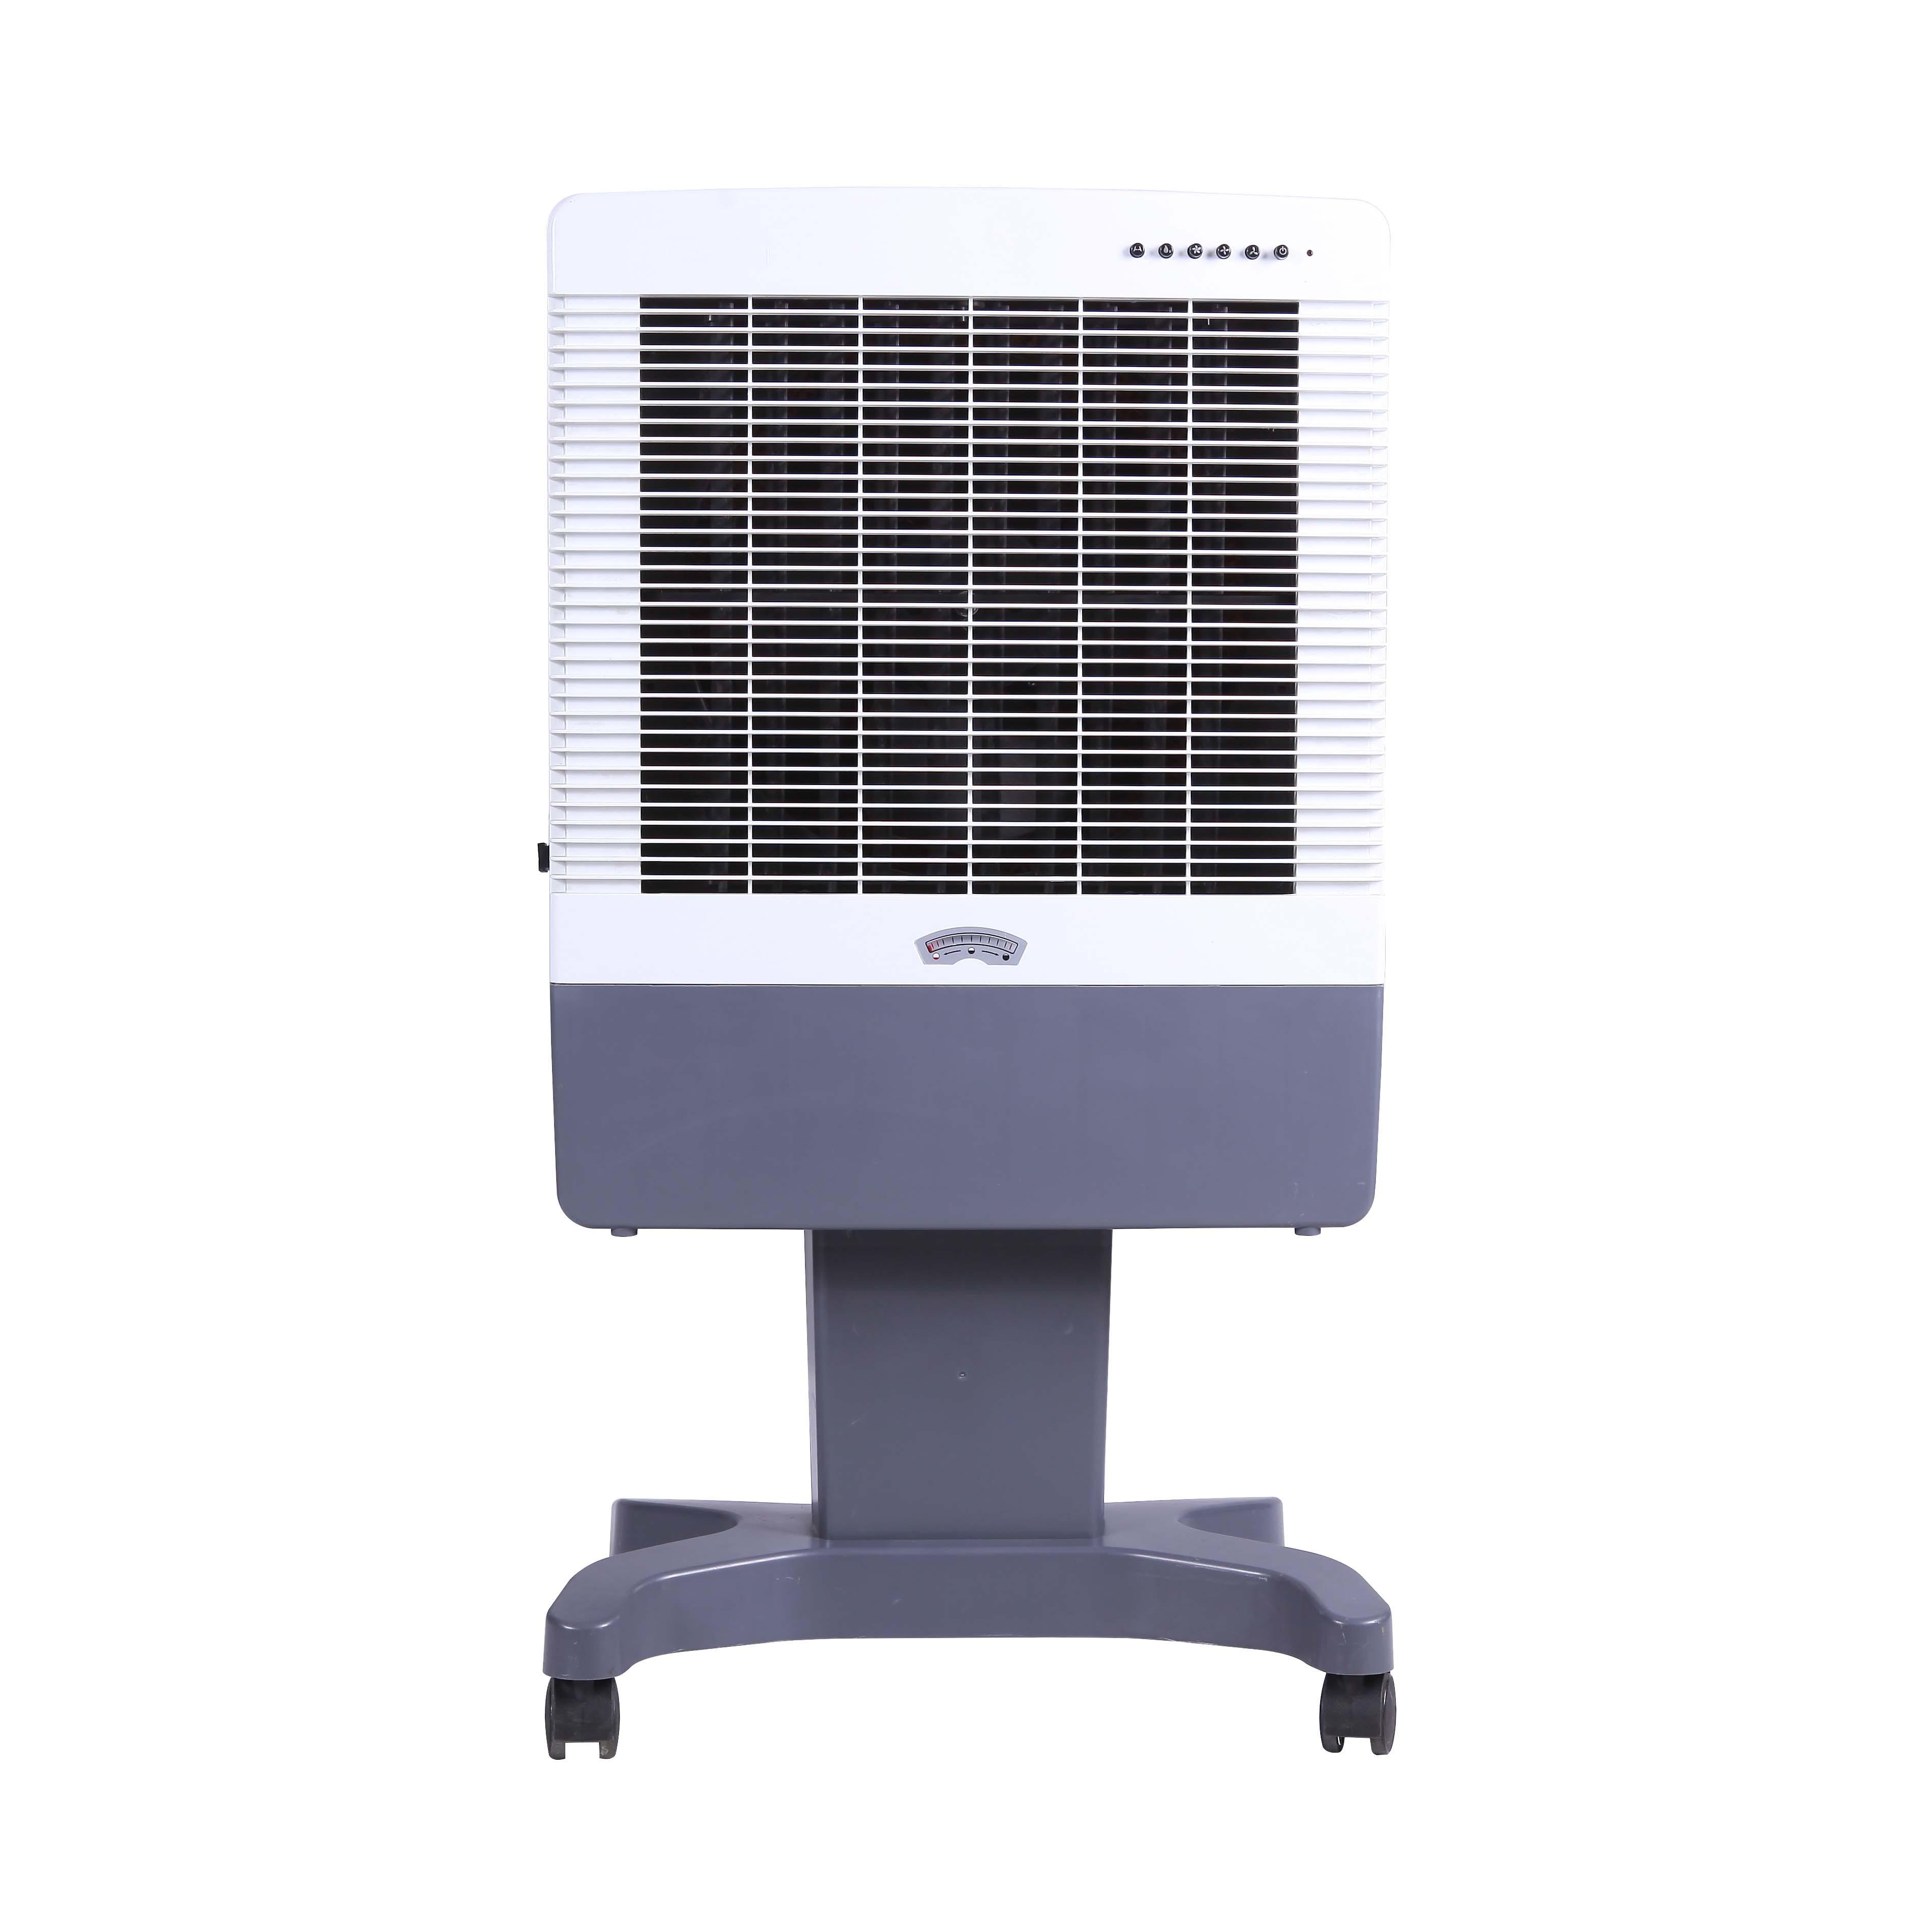 LEBON/雷豹 MFC1600 空调扇怎么样,评测